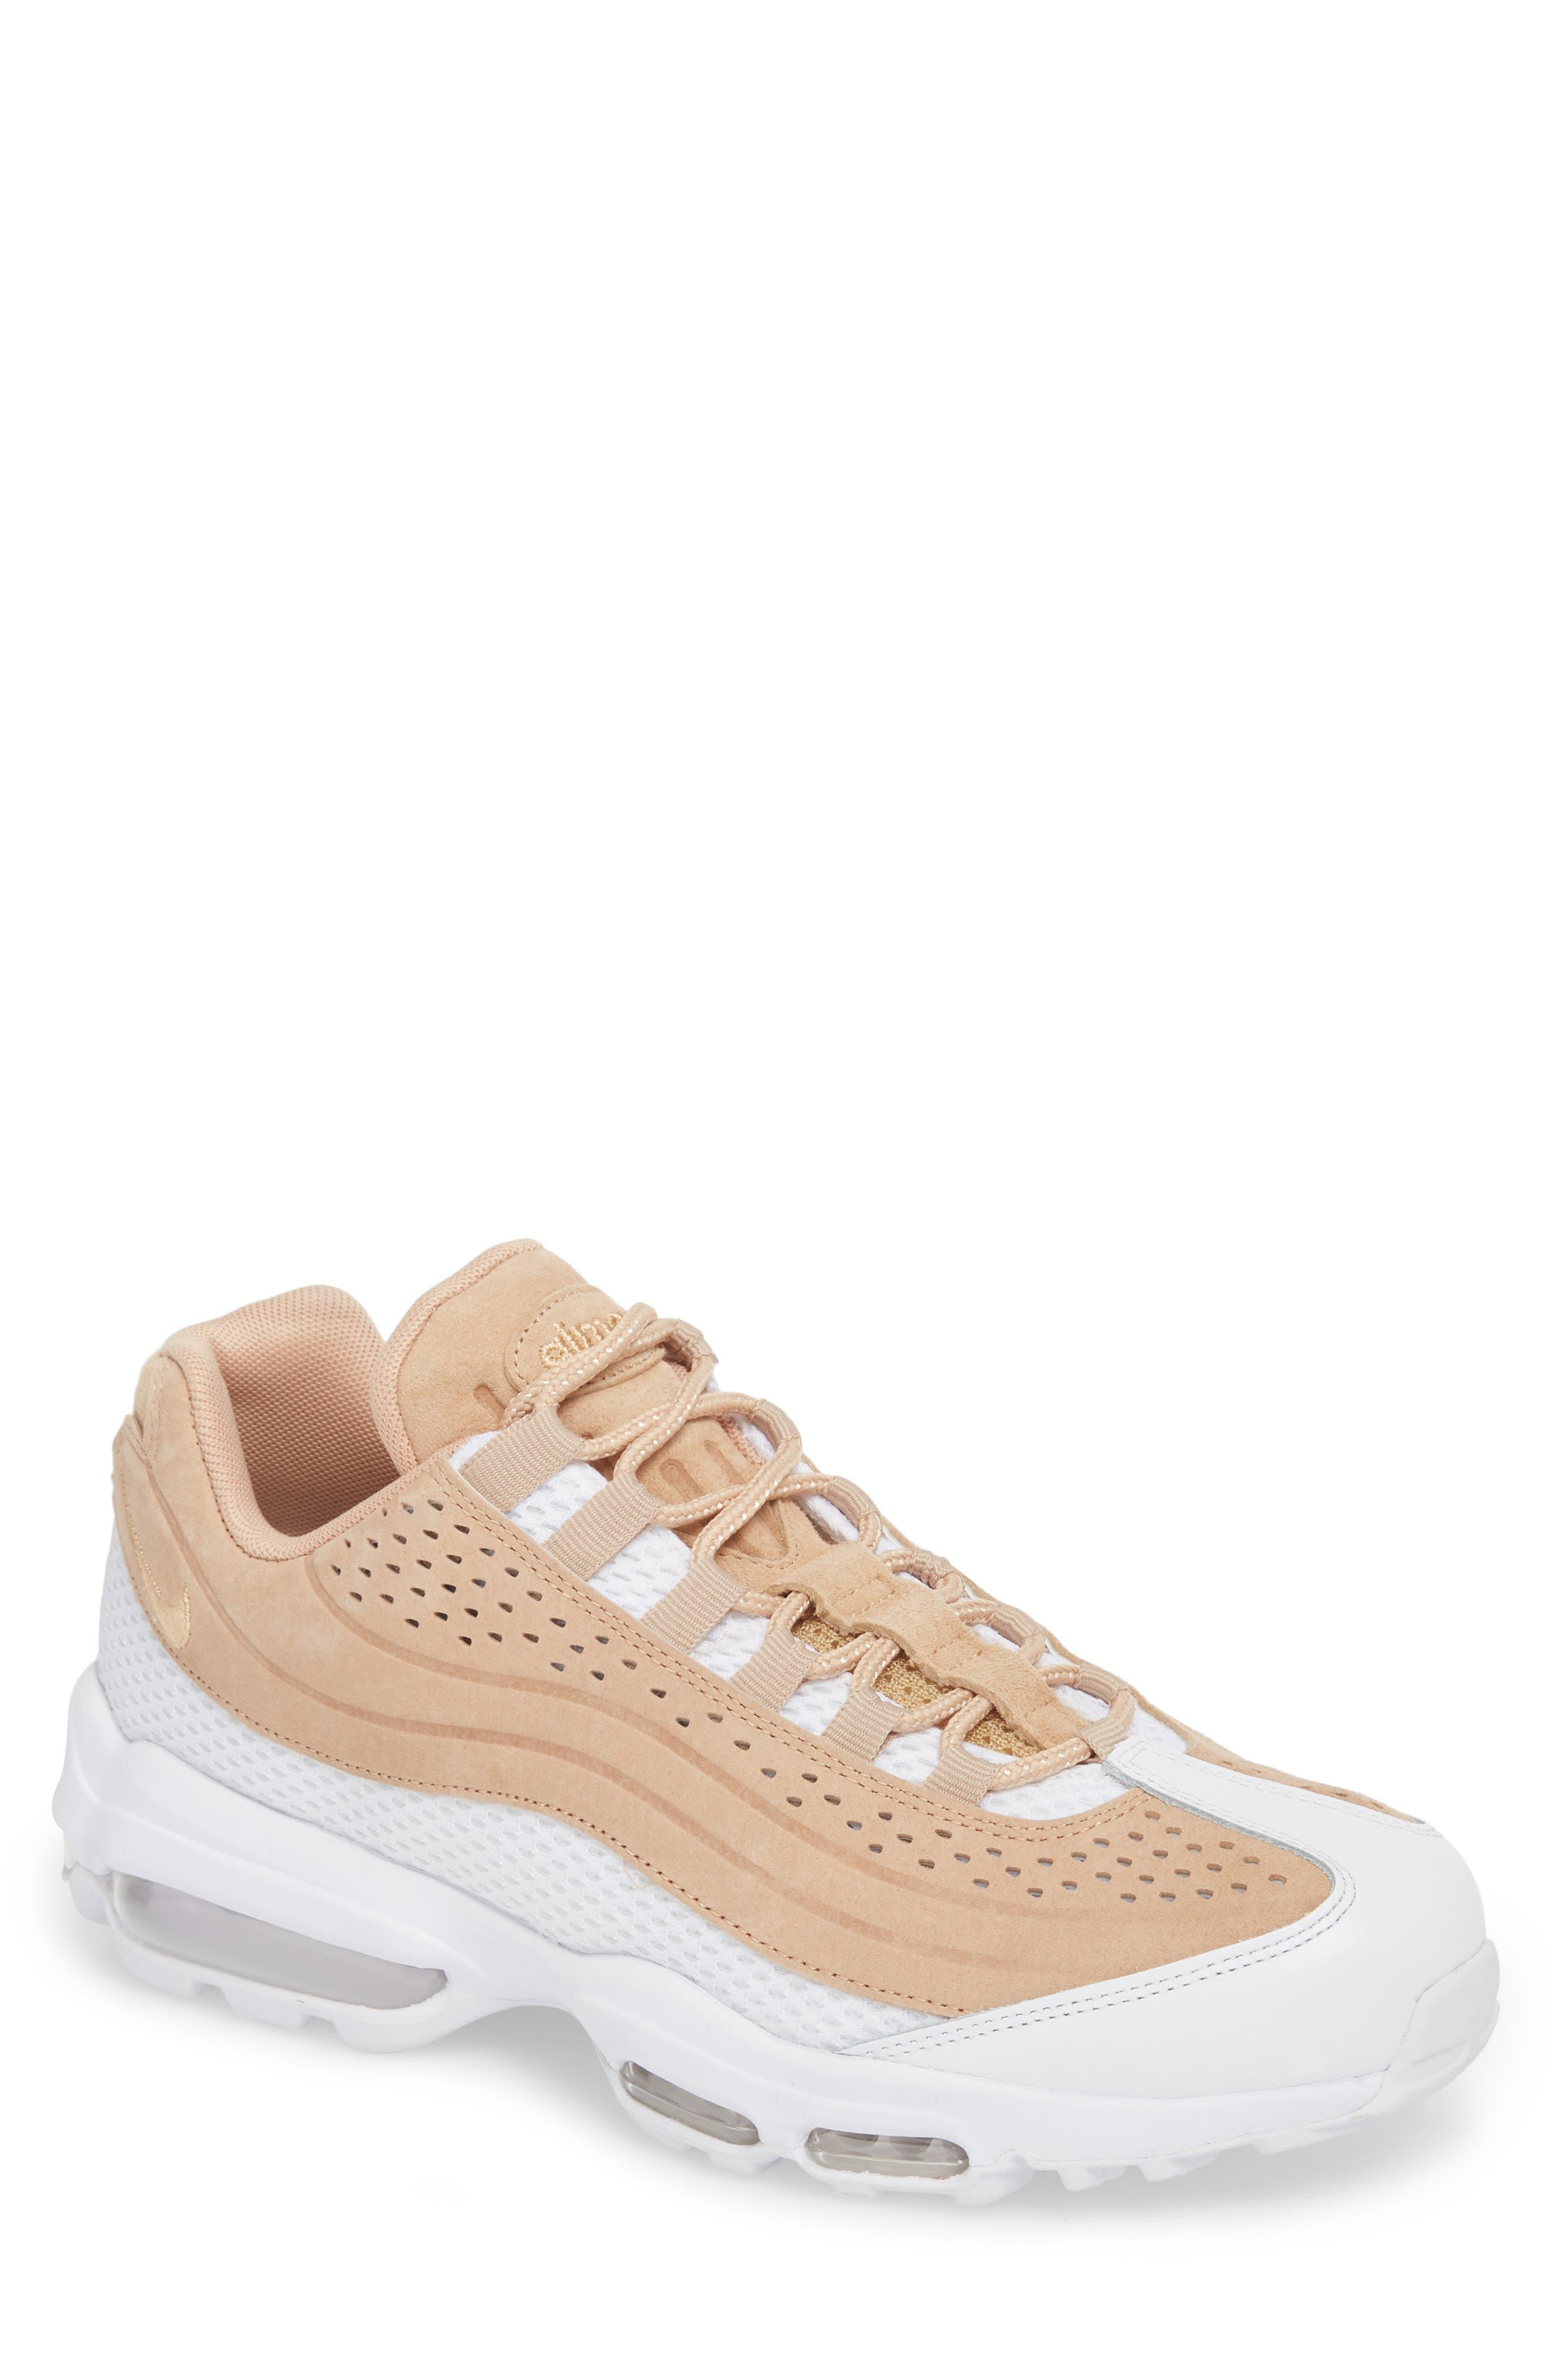 Air Max 95 Ultra Premium Sneaker,                         Main,                         color, Vachetta Tan/ White